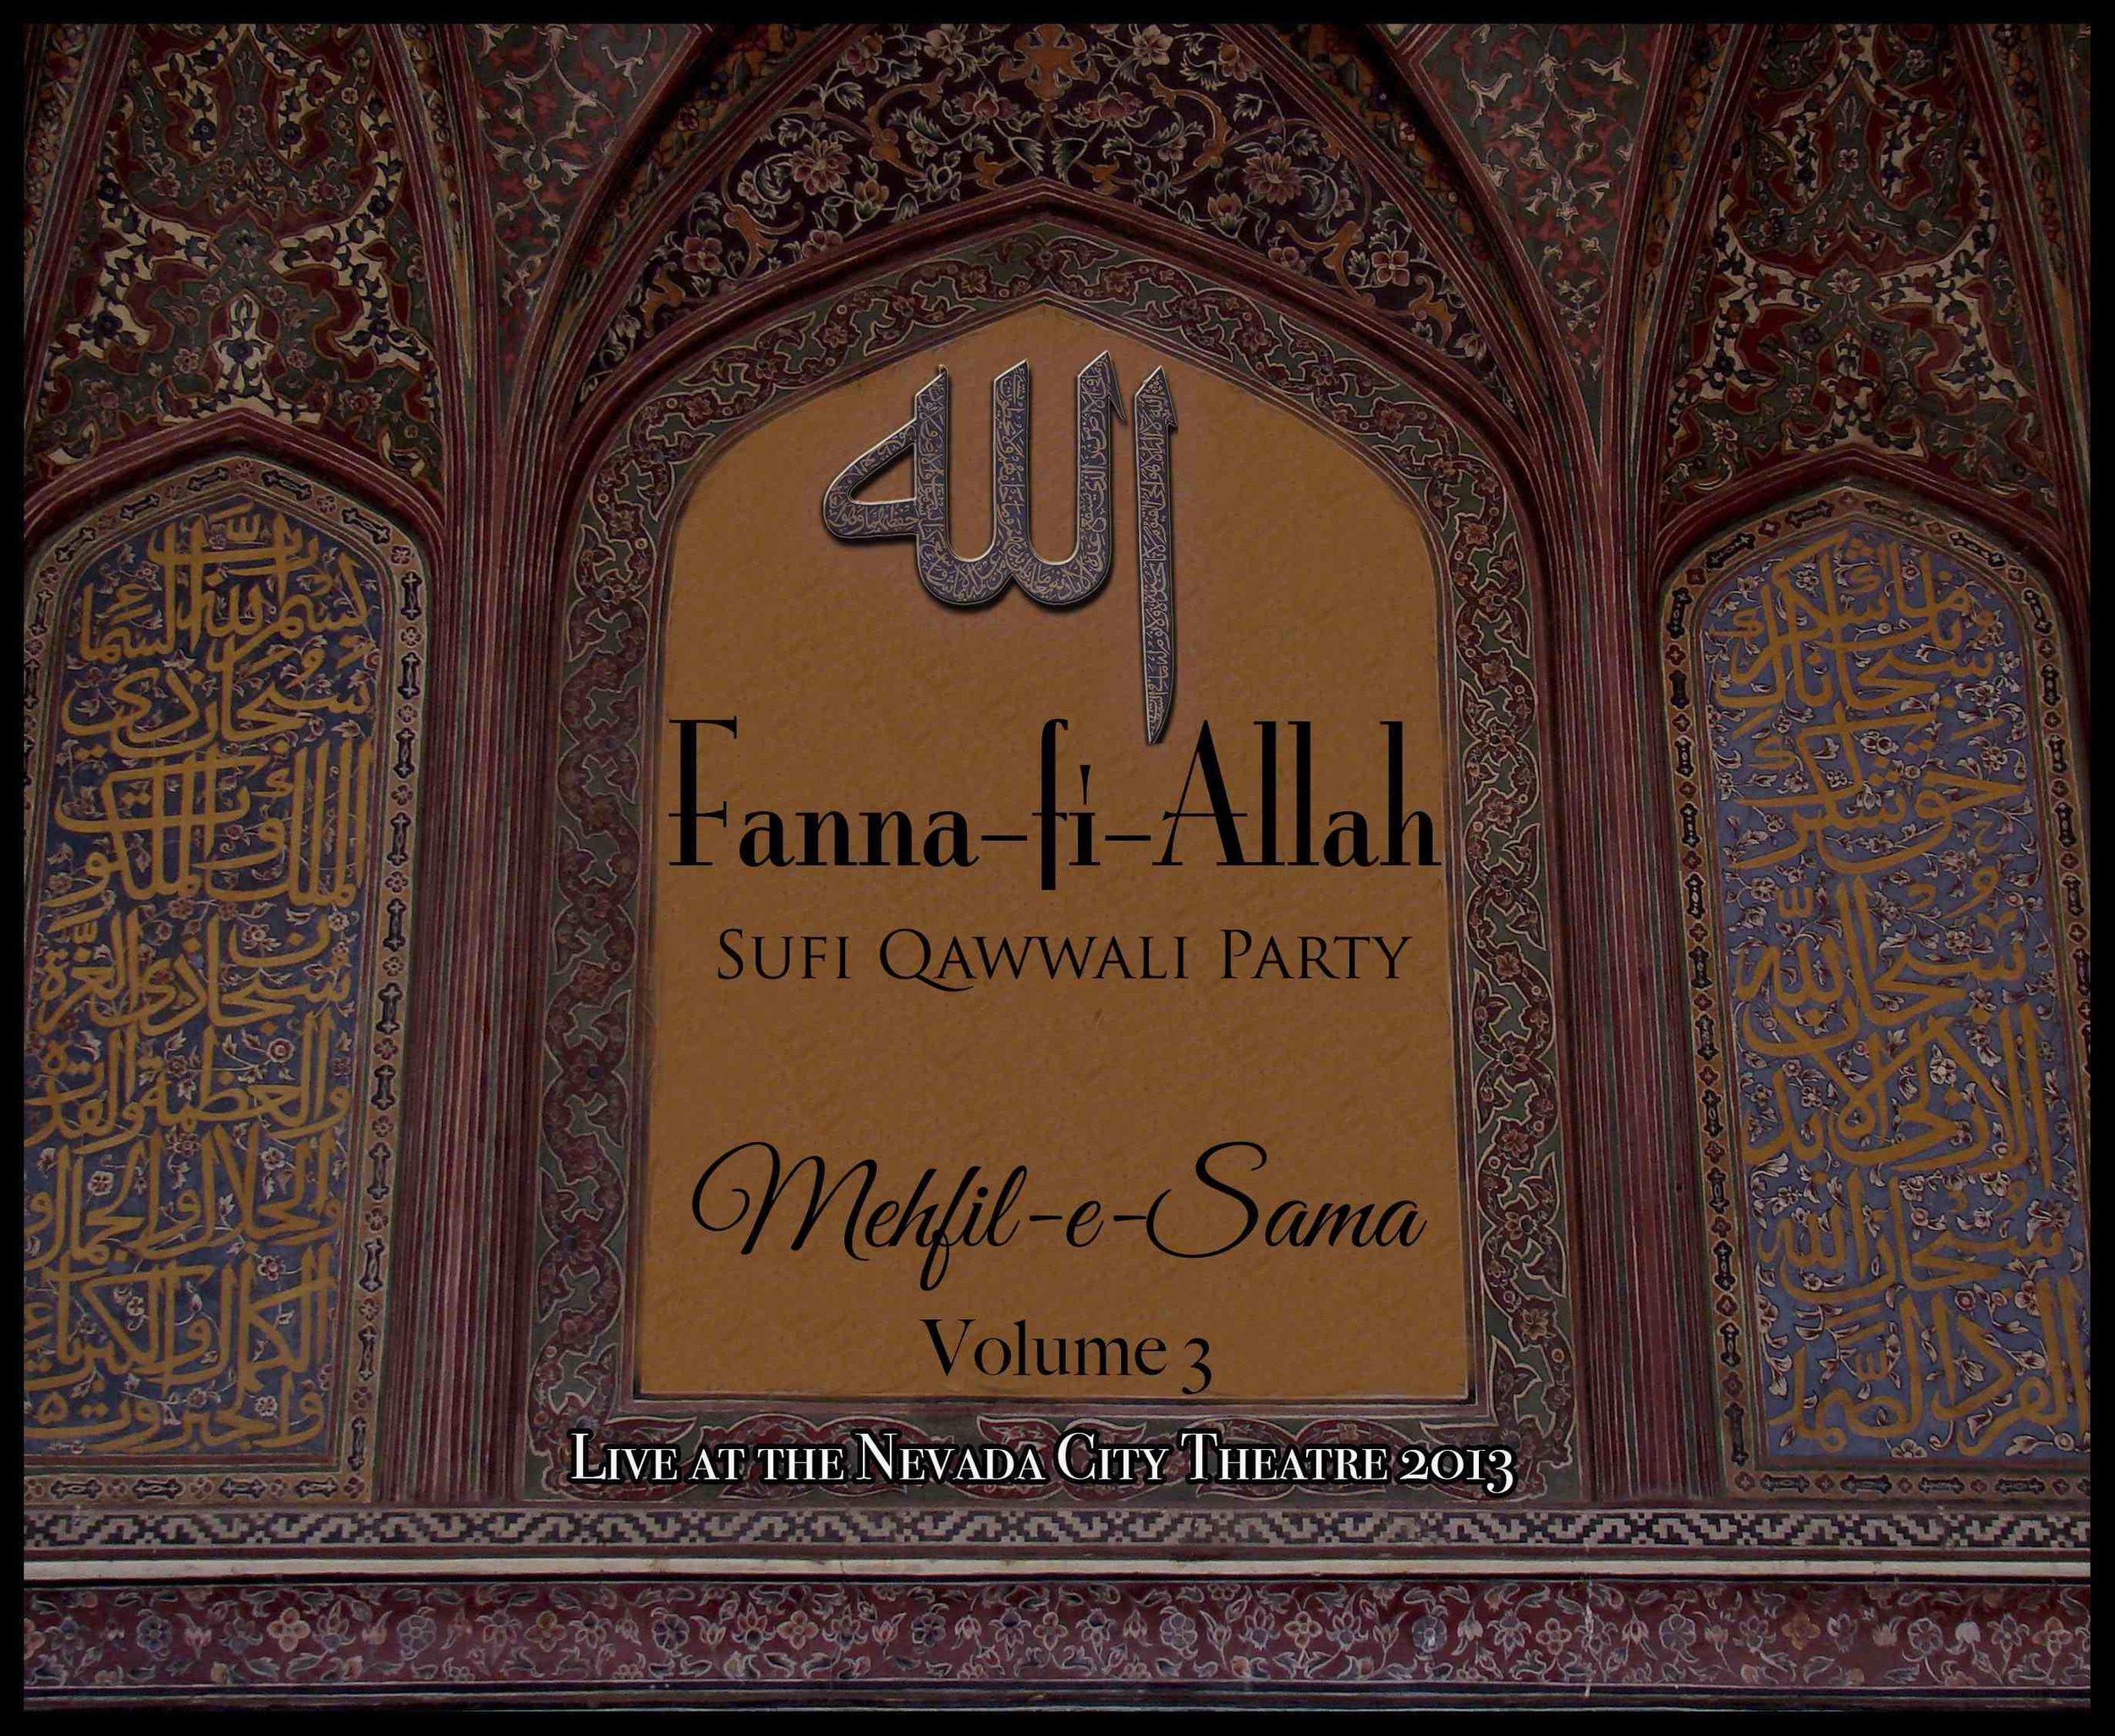 Mehfil-e-sama vol.3 - 2014